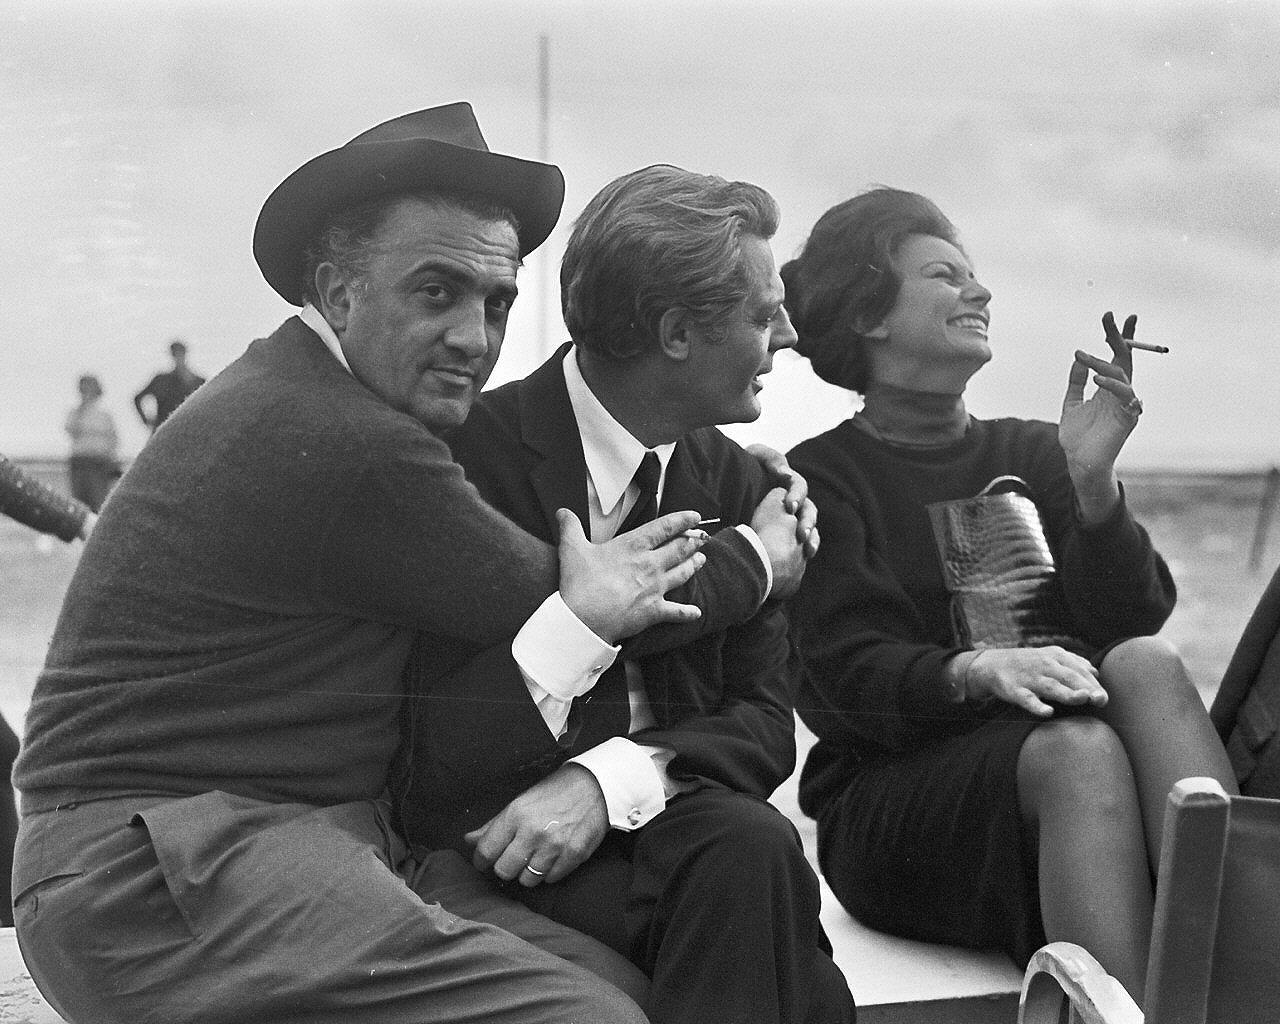 http://2.bp.blogspot.com/-juQ_DueU6UY/UOEFWTjyzPI/AAAAAAAADWA/SWuPCsLotLo/s1600/Federico-Fellini-Marcello-Mastroianni-and-Sophia-Loren.jpeg